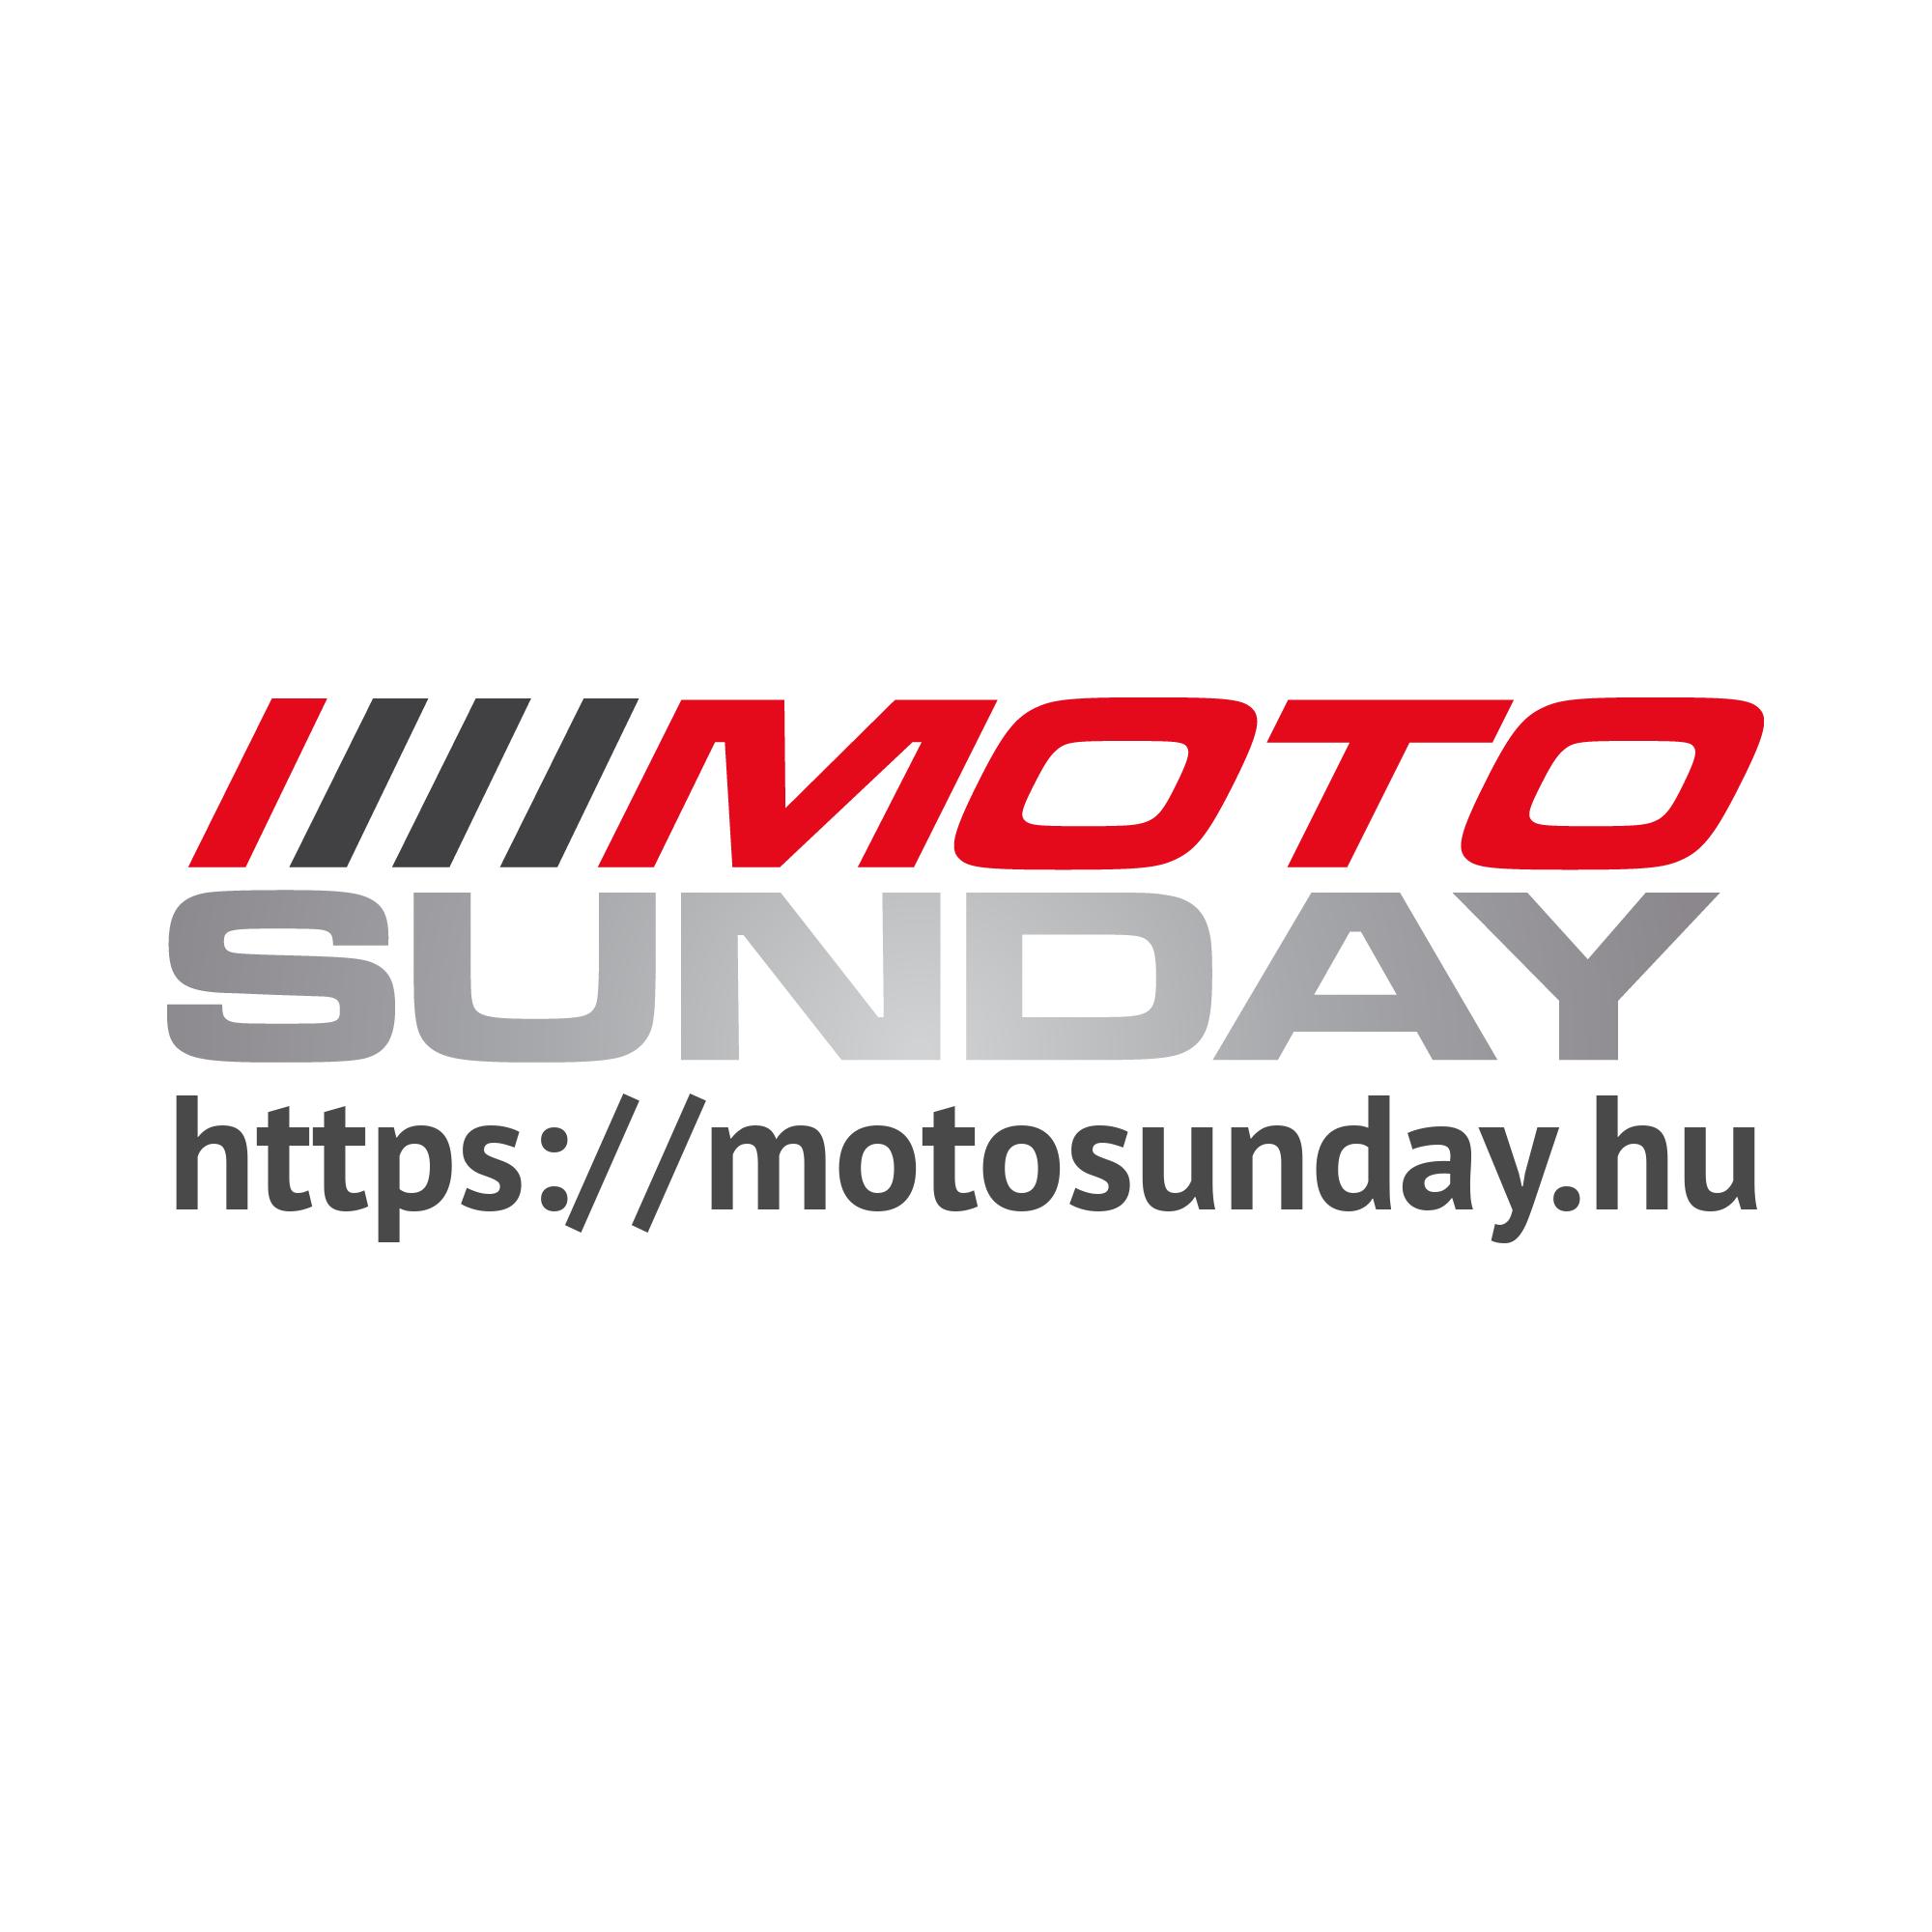 MotoSunday